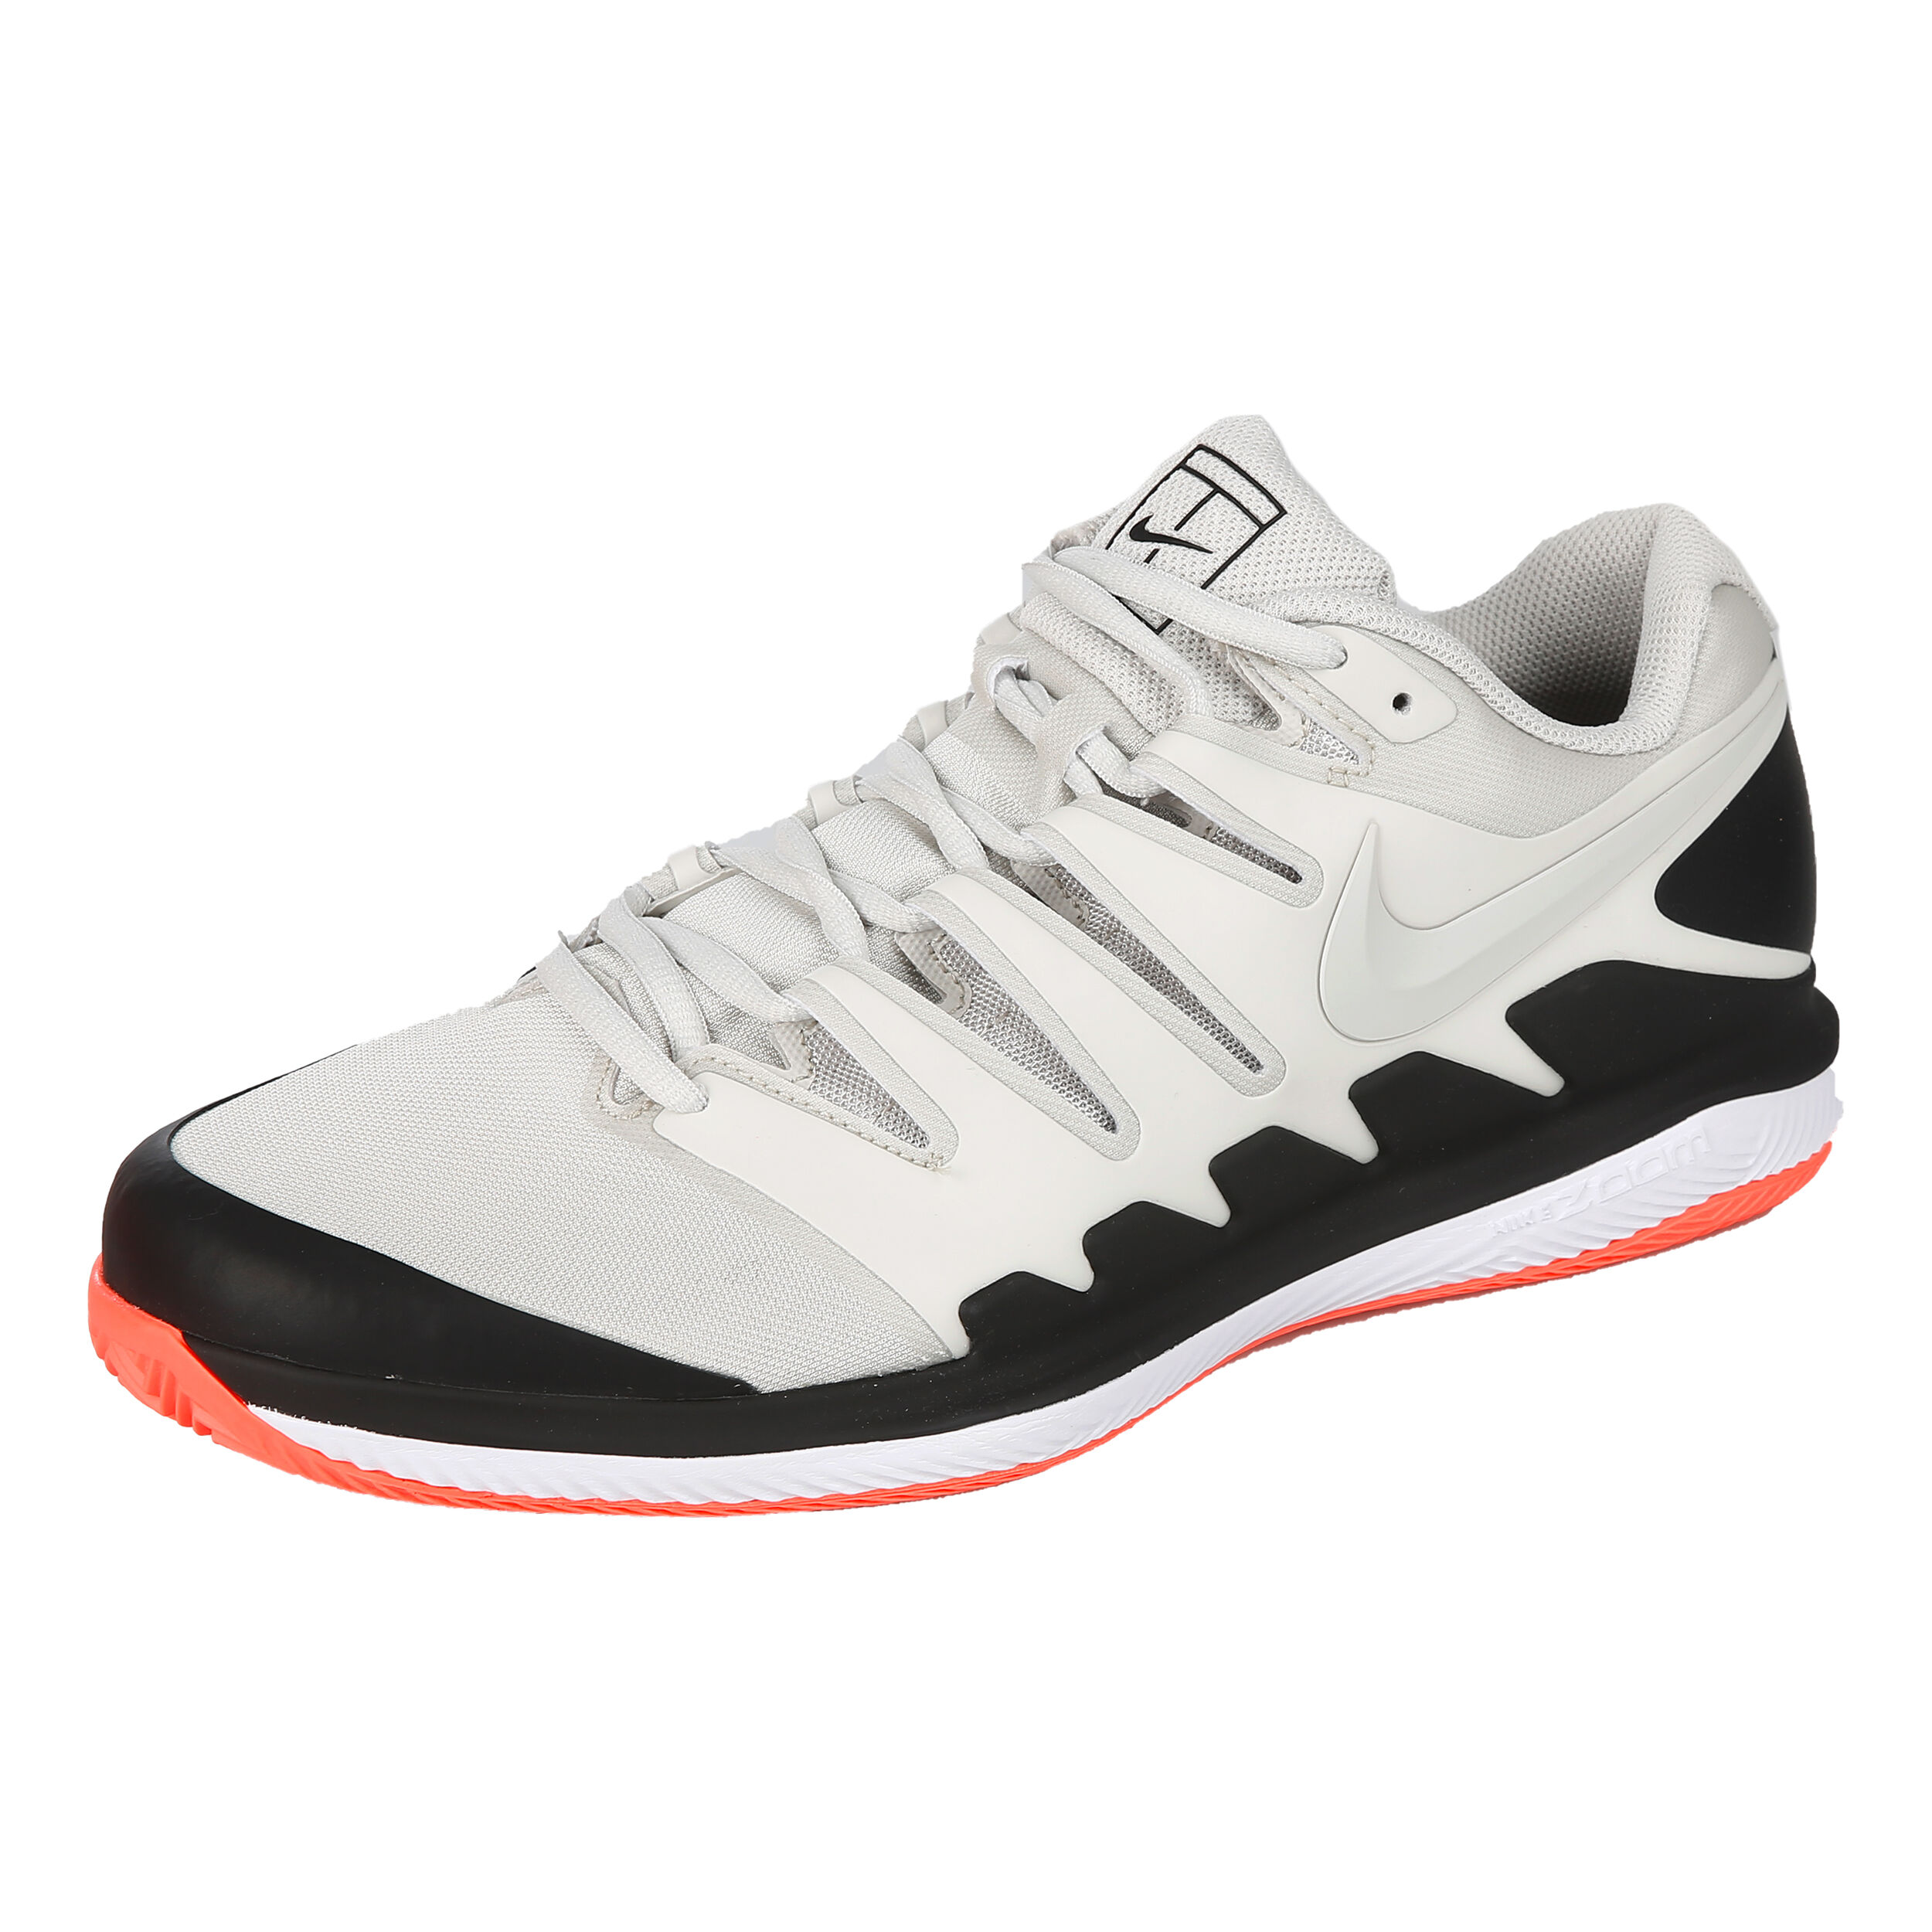 Nike Air Zoom Vapor X Clay Scarpa Per Terra Rossa Uomini Beige, Nero